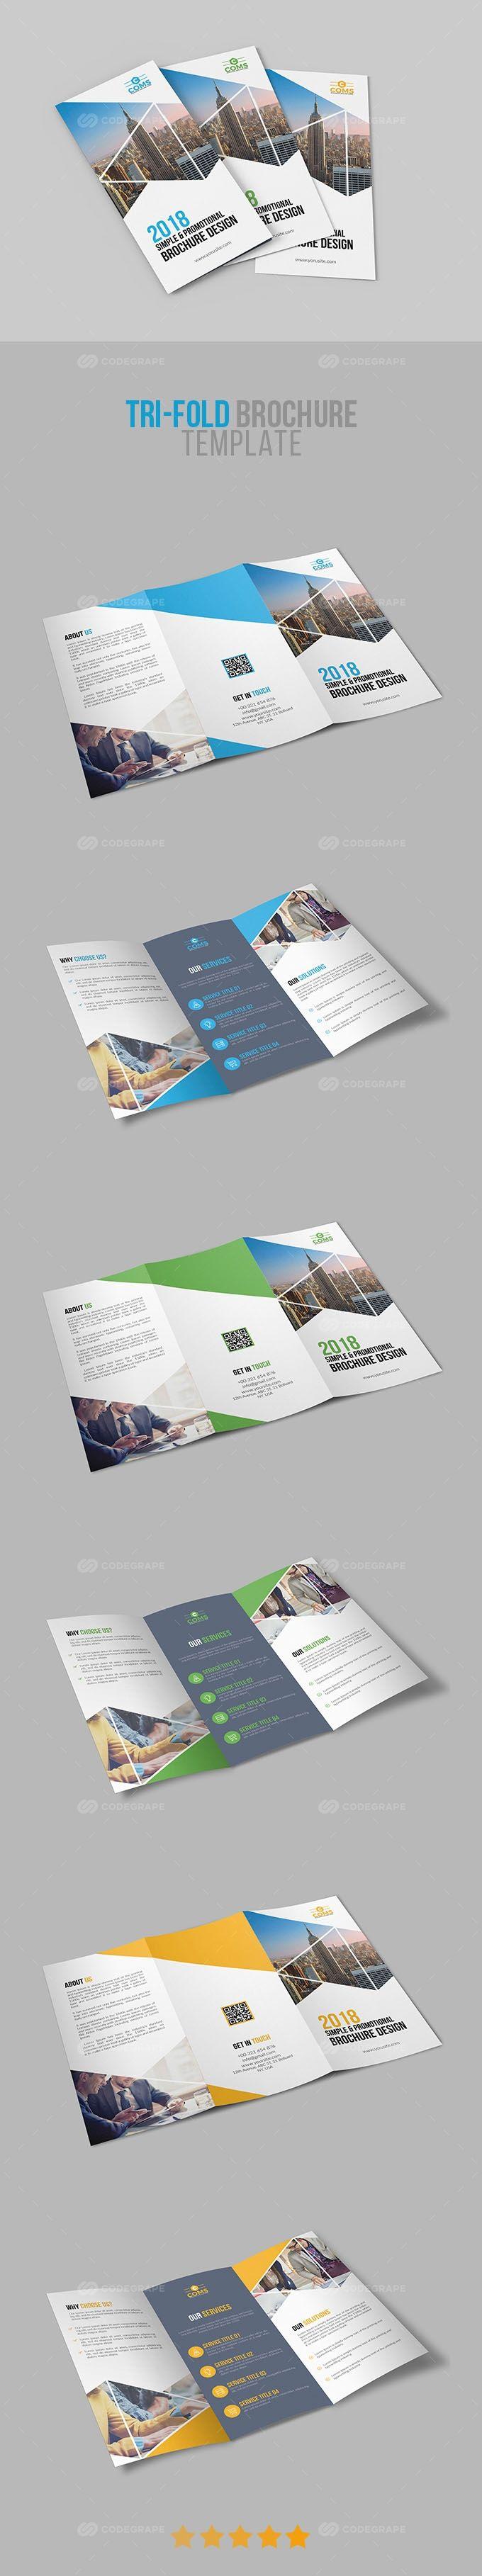 Corporate Tri-Fold Brochure Template 02 on @codegrape. More Info: https://www.codegrape.com/item/corporate-tri-fold-brochure-template-02/17416